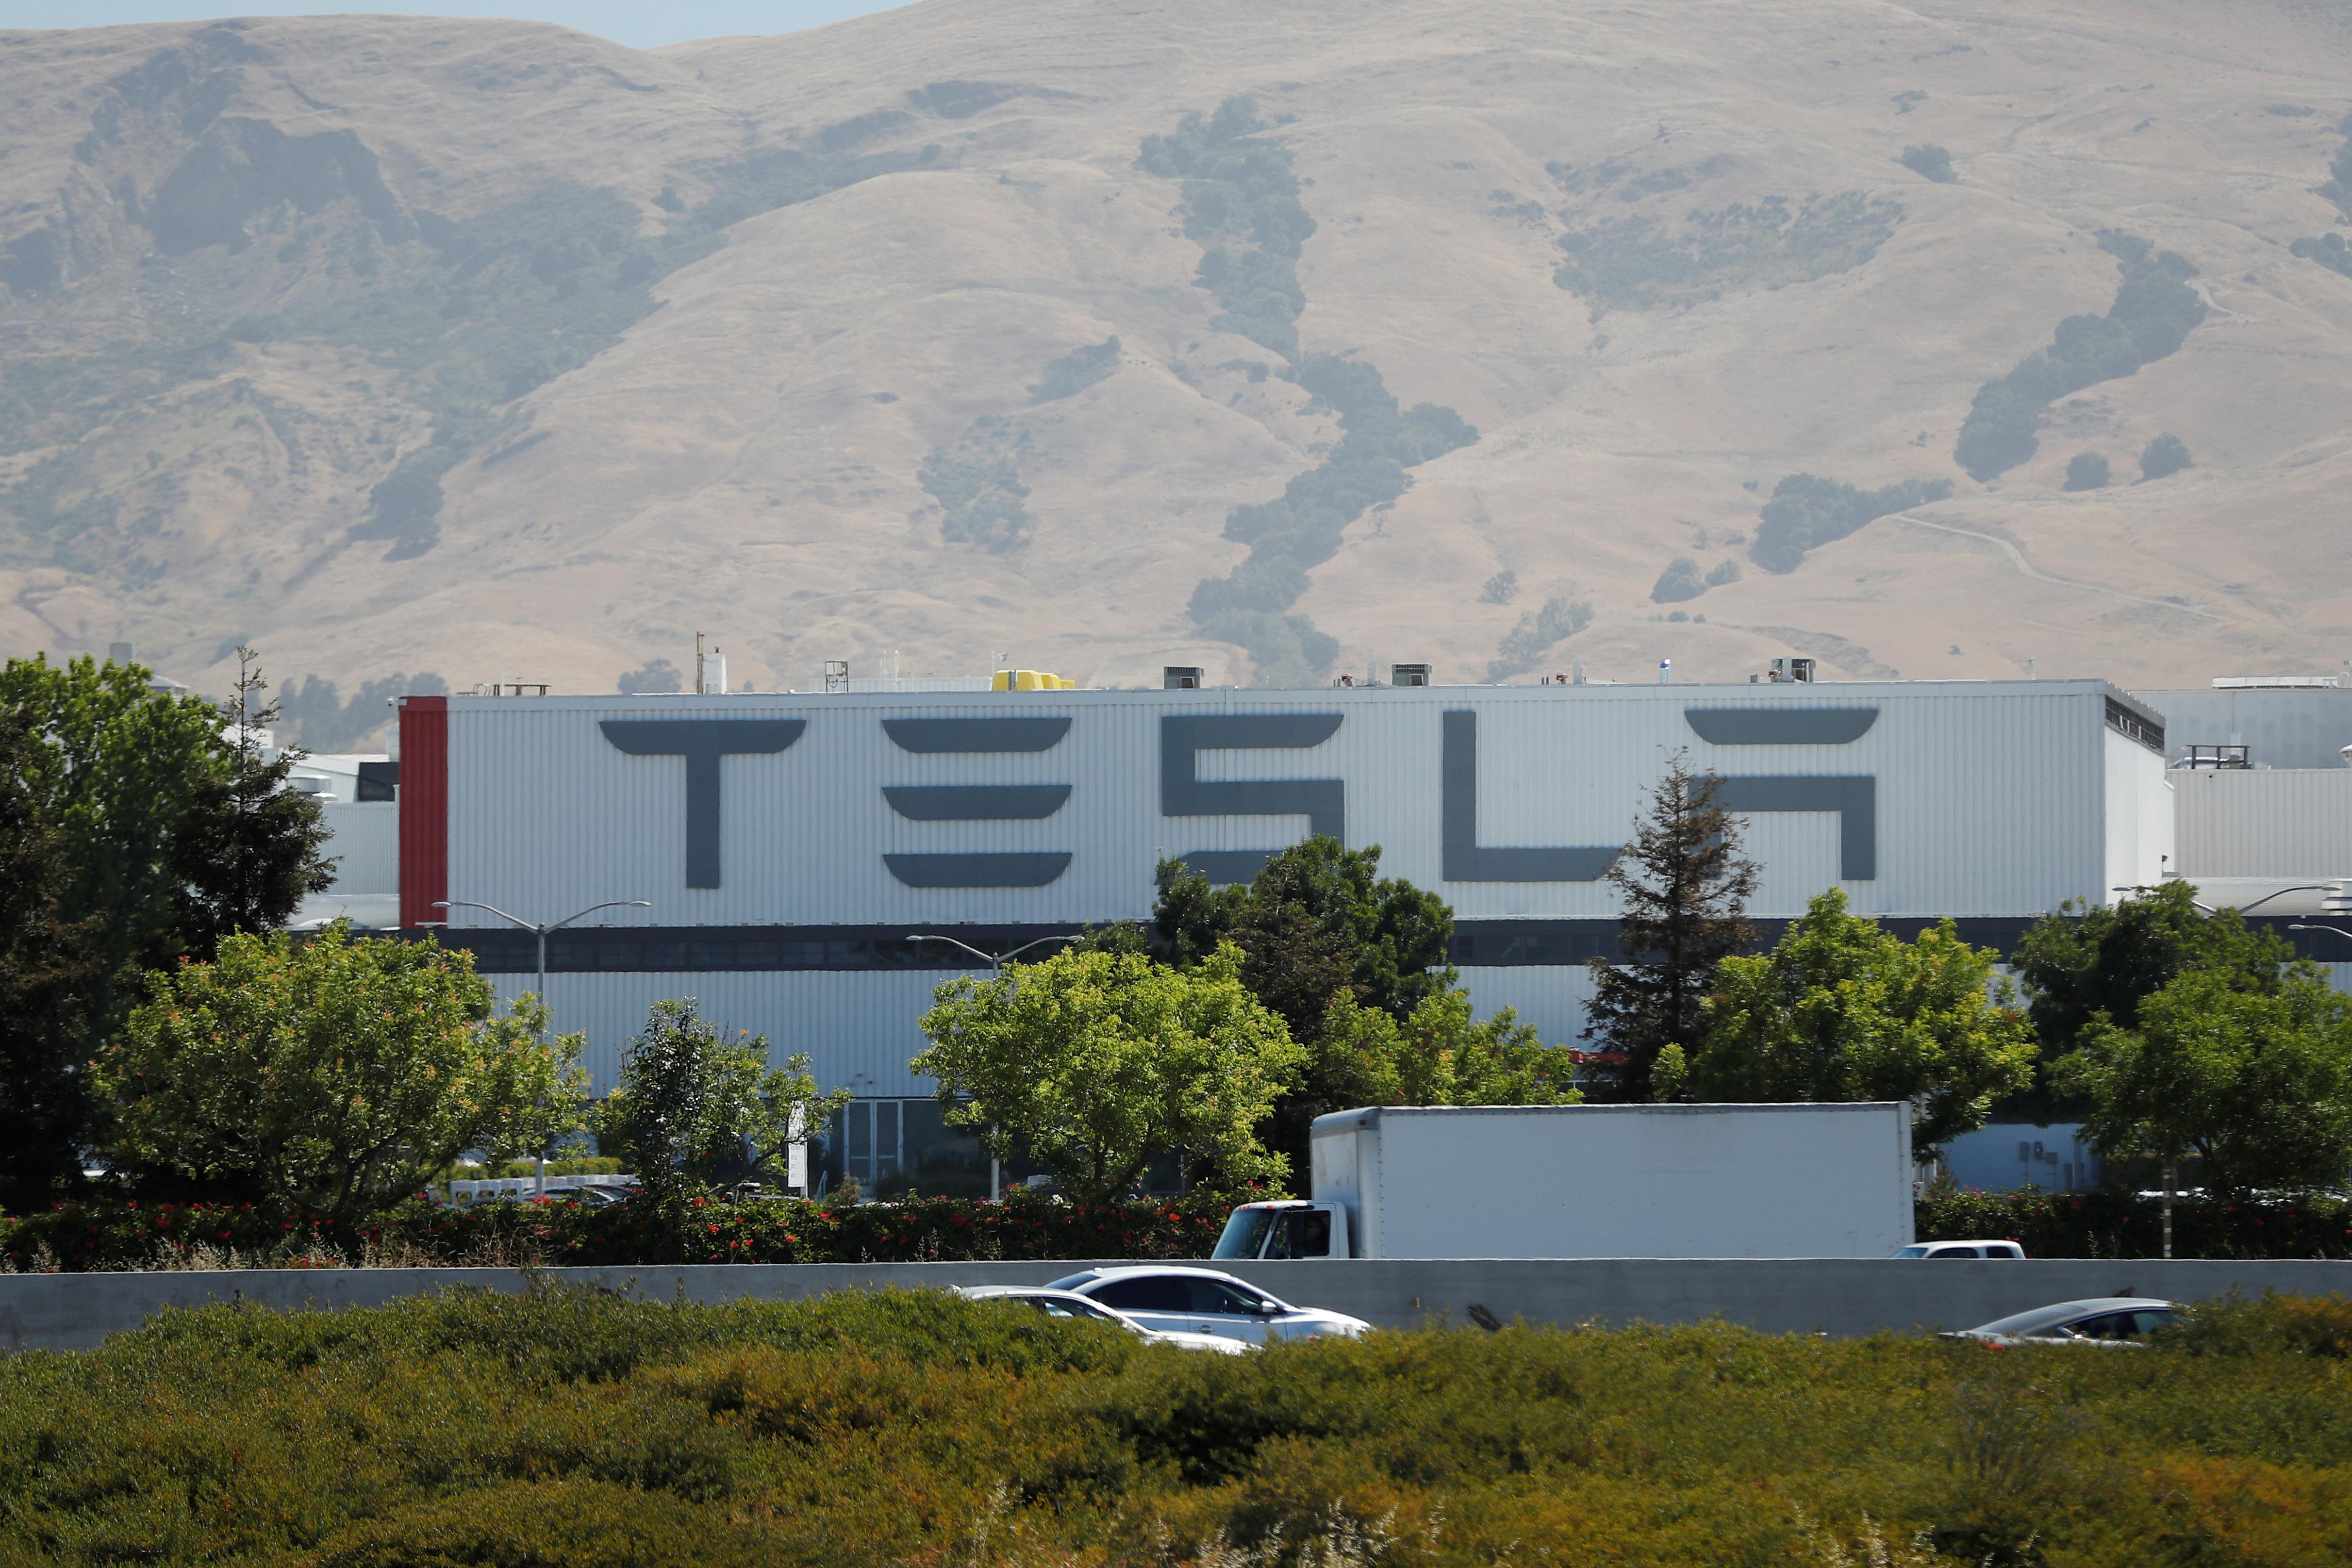 Tesla to make Model Y SUV at its California factory